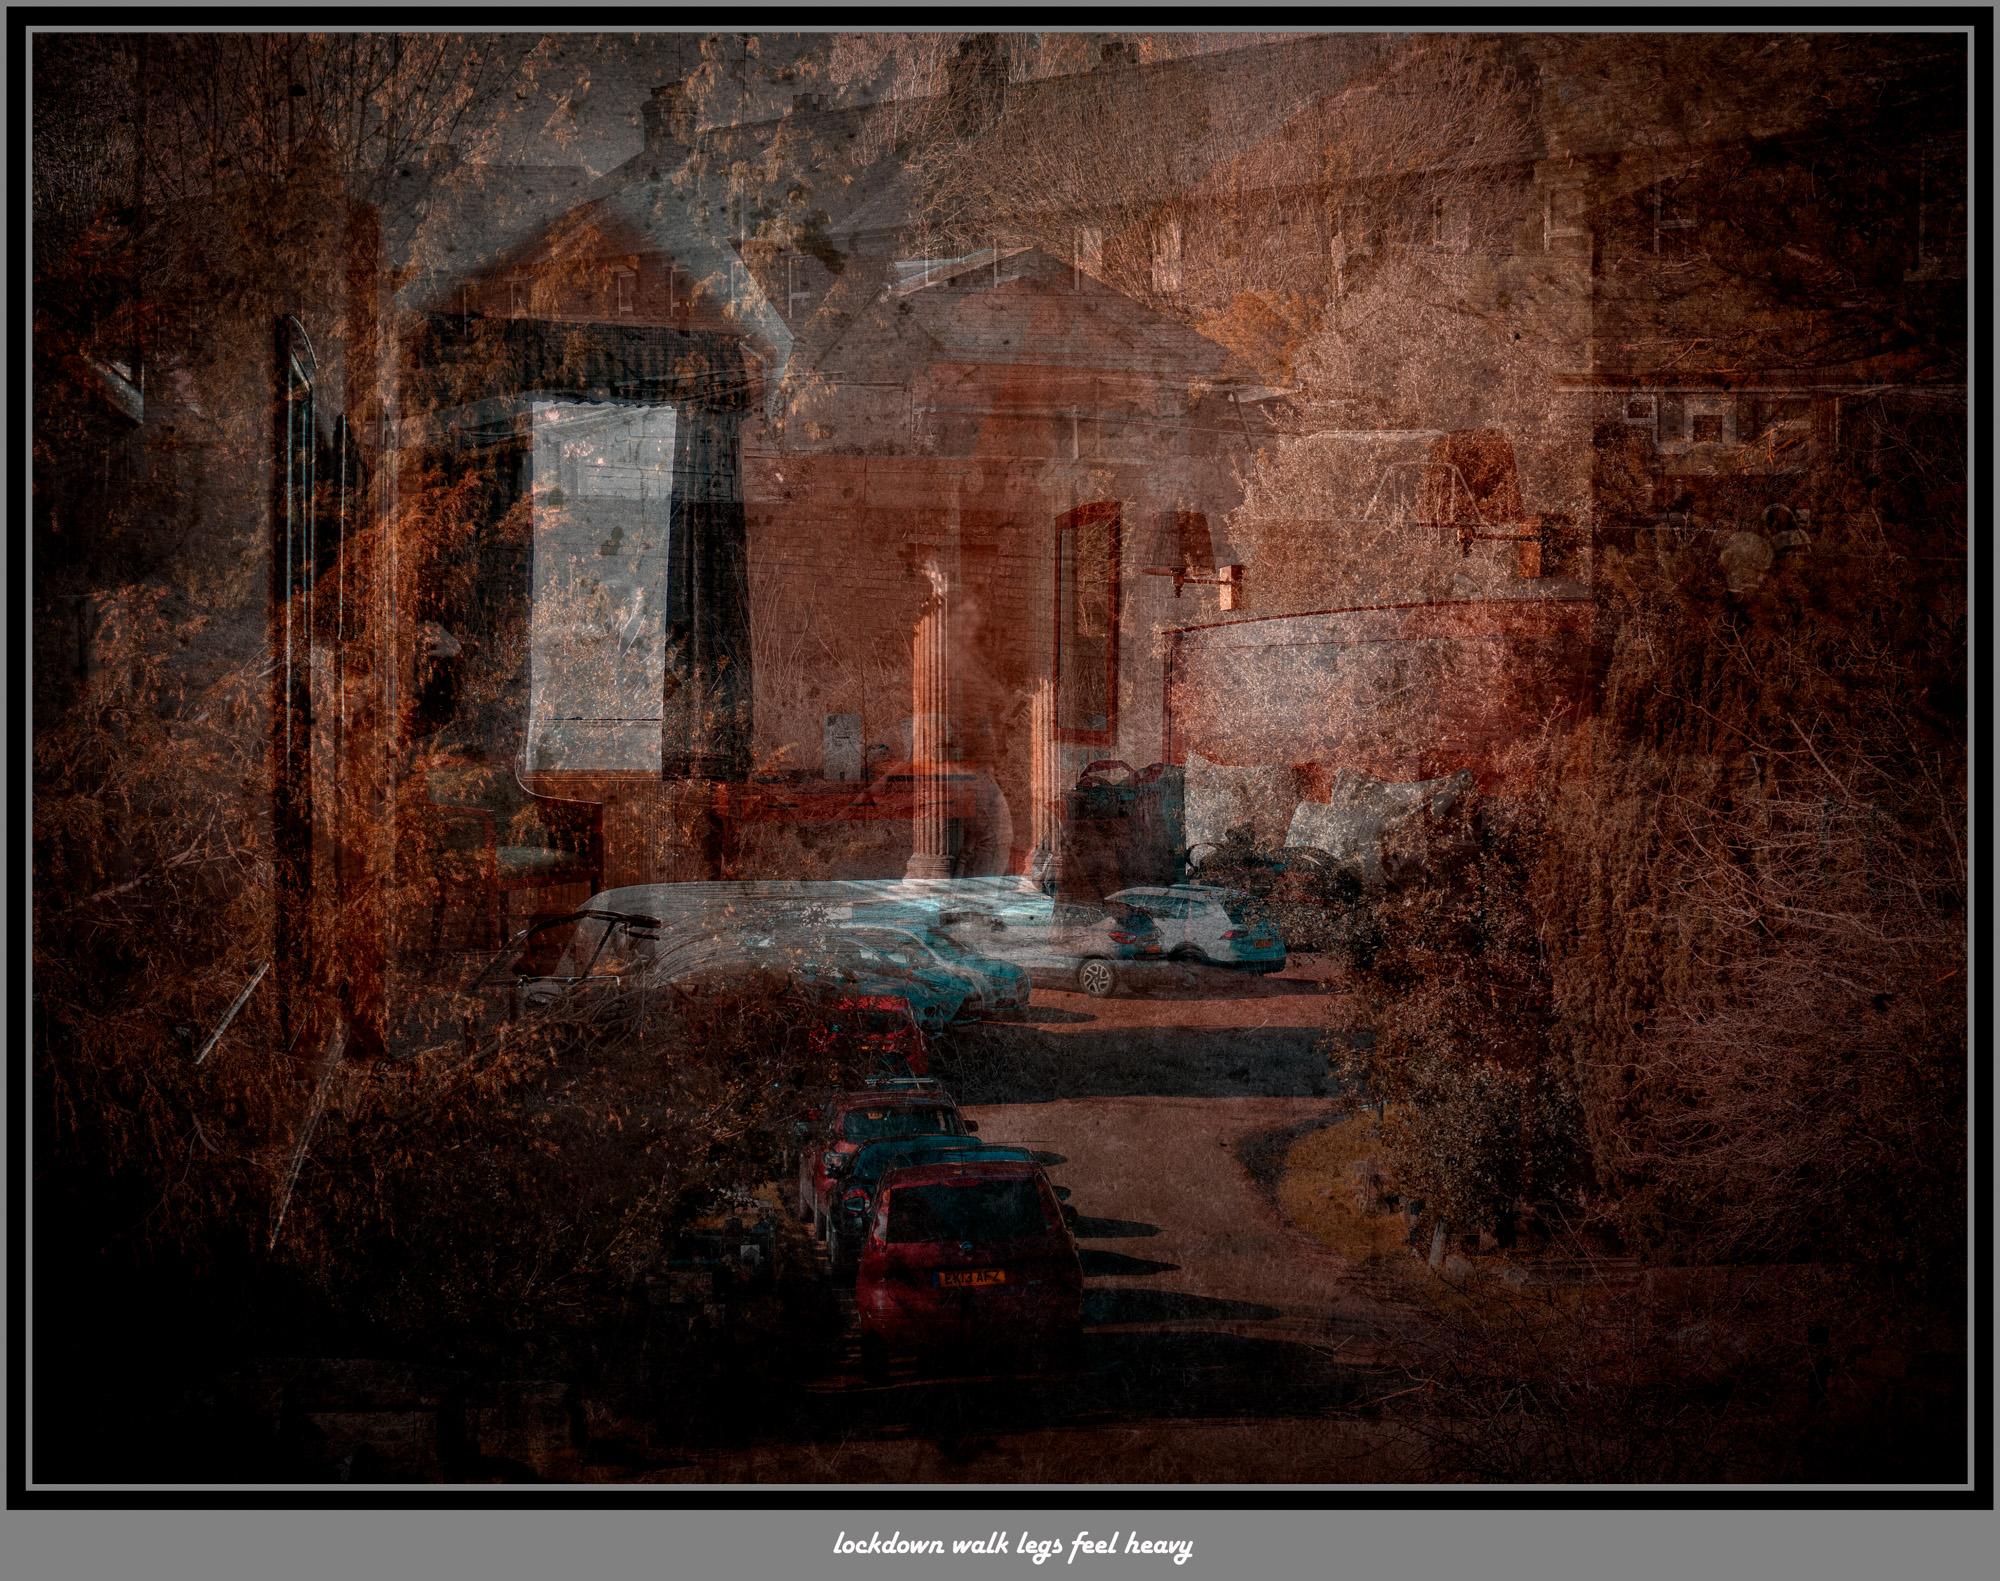 Lockdown strolls ©Stewart Wall 2020